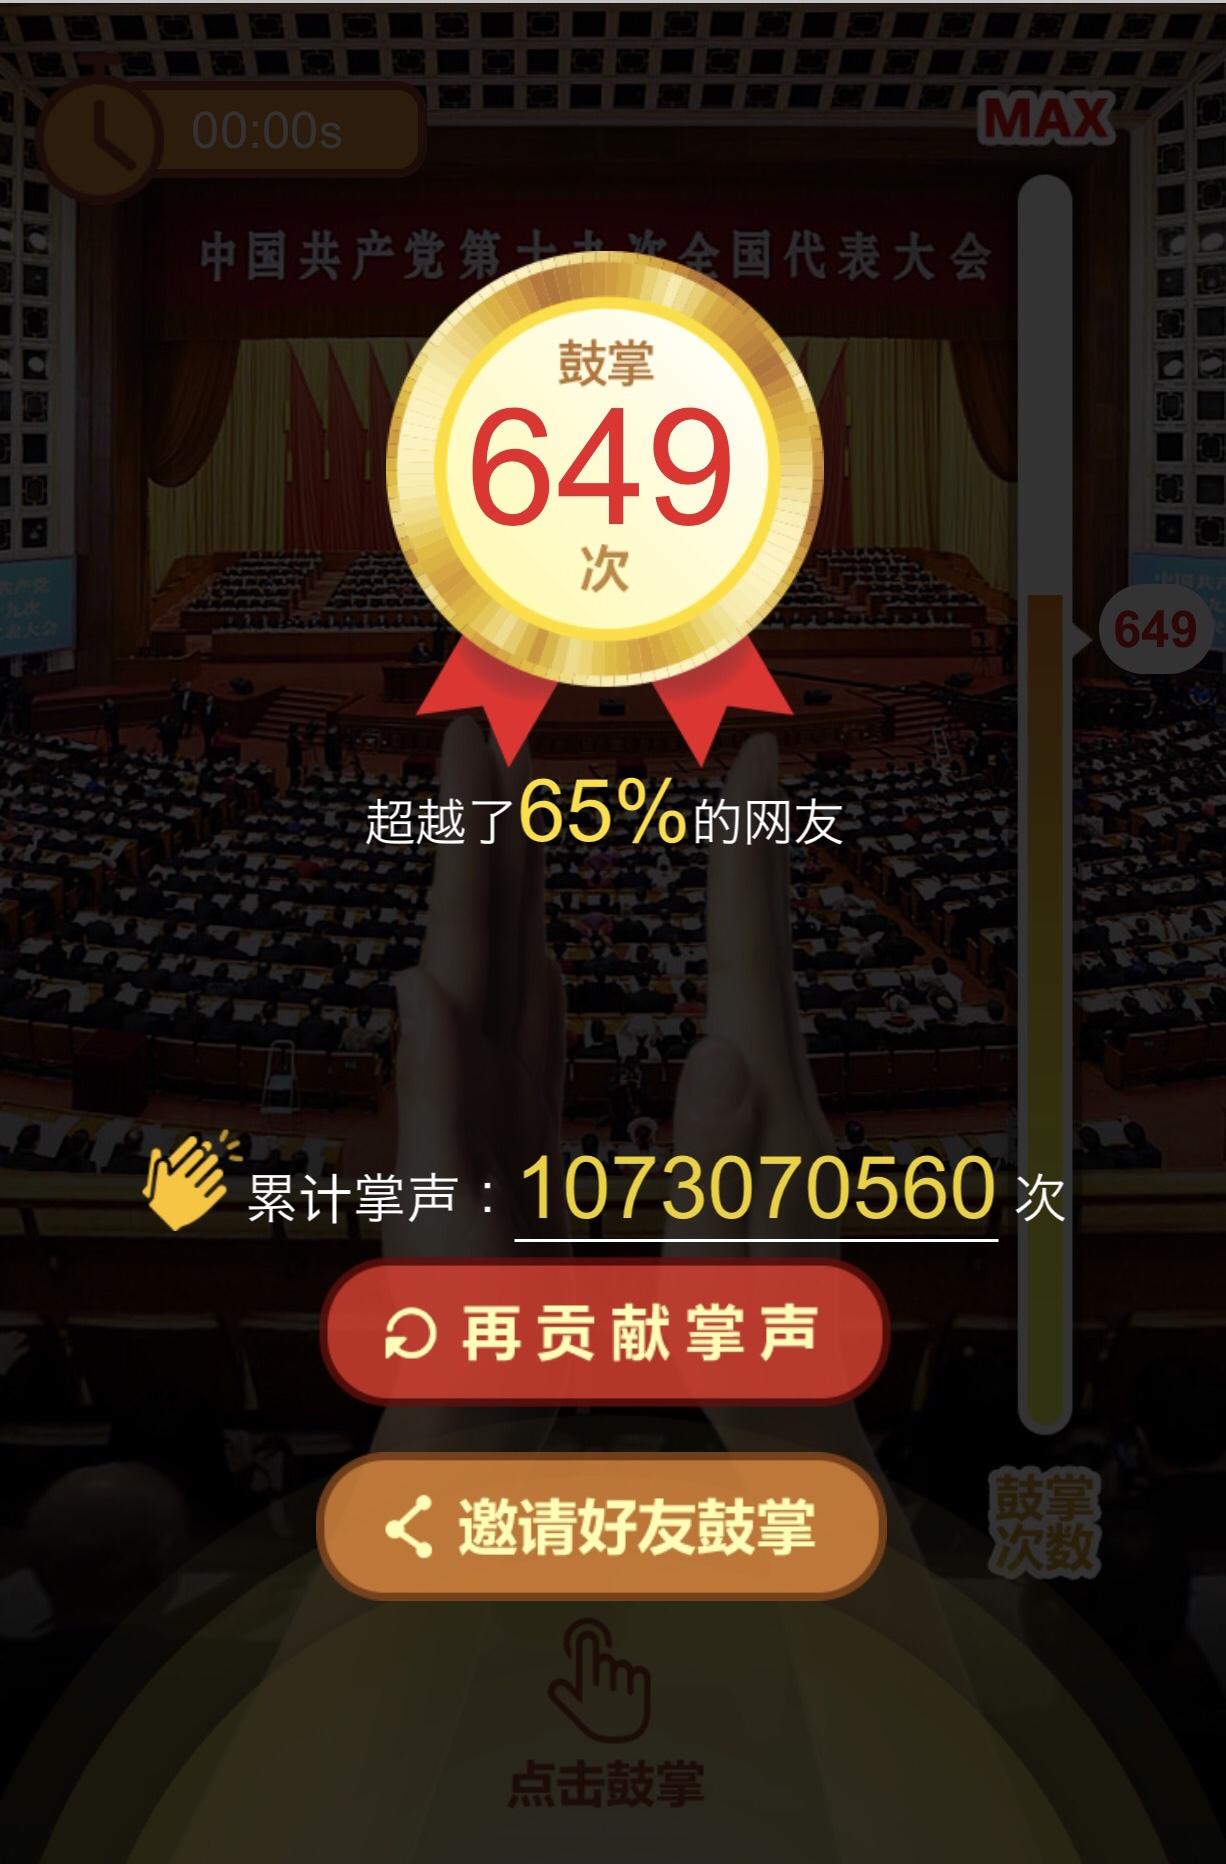 IMG 1080 - Application / jeu mobile : applaudissons Xi Jinping !